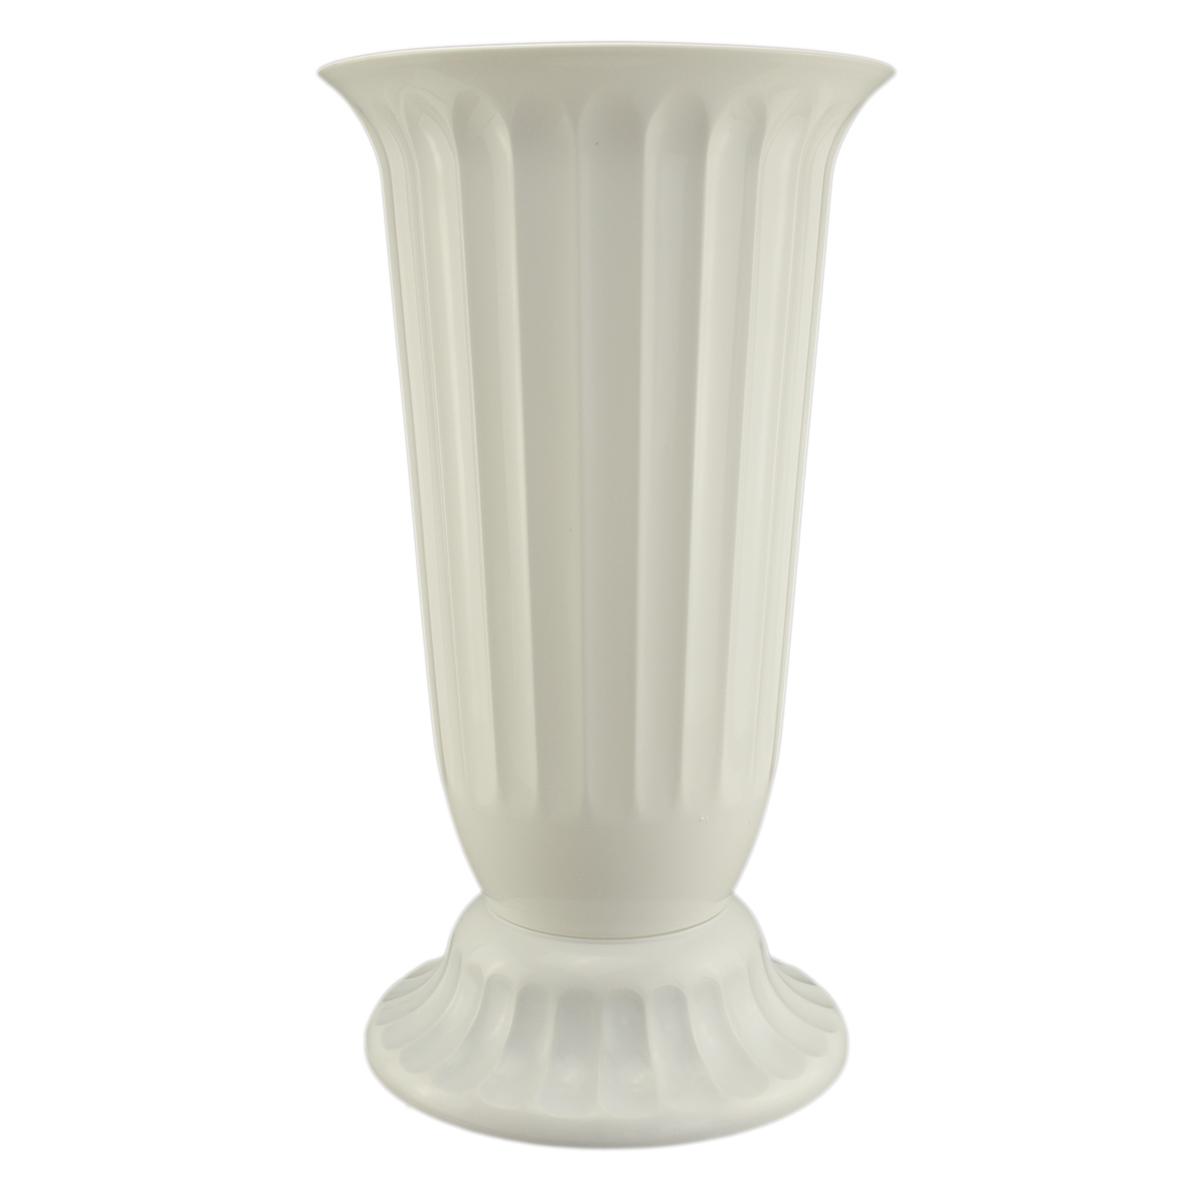 Ambalaje Flori ONLINE vinde Vaza podea 27x50 cm alb la pretul de 24.99 lei